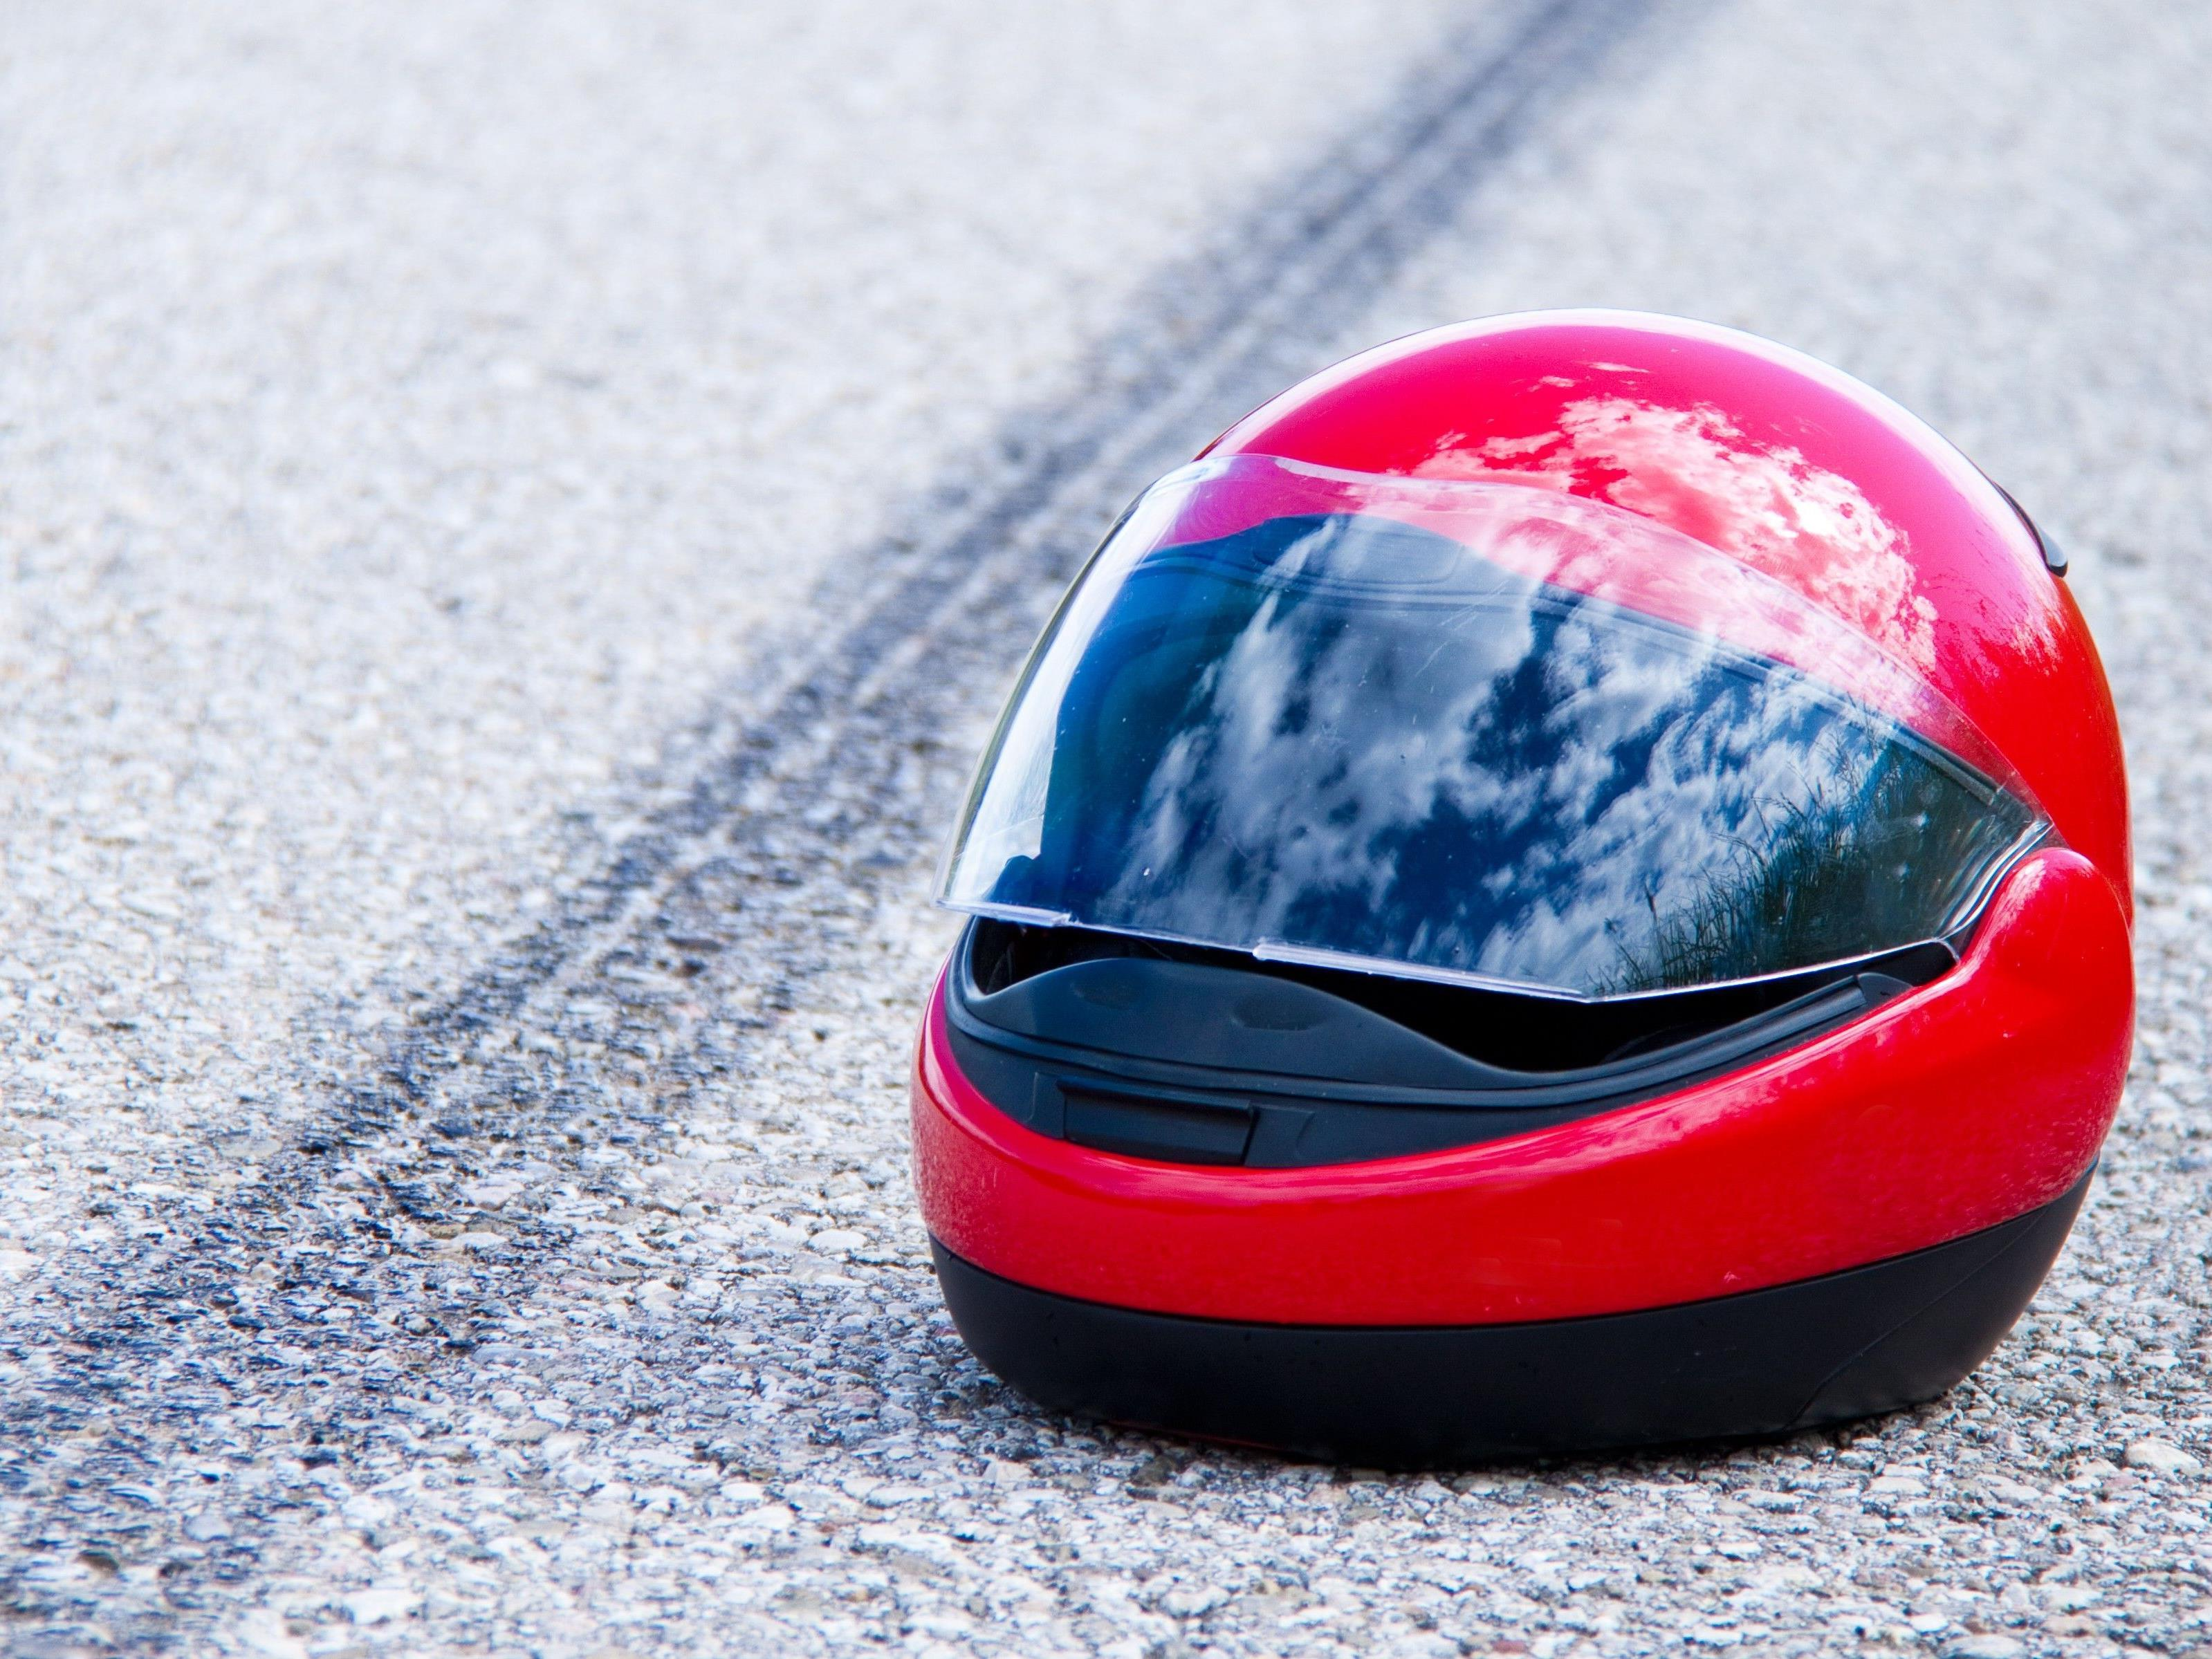 Mopedfahrerin übersah einen Pkw in Feldkirch.